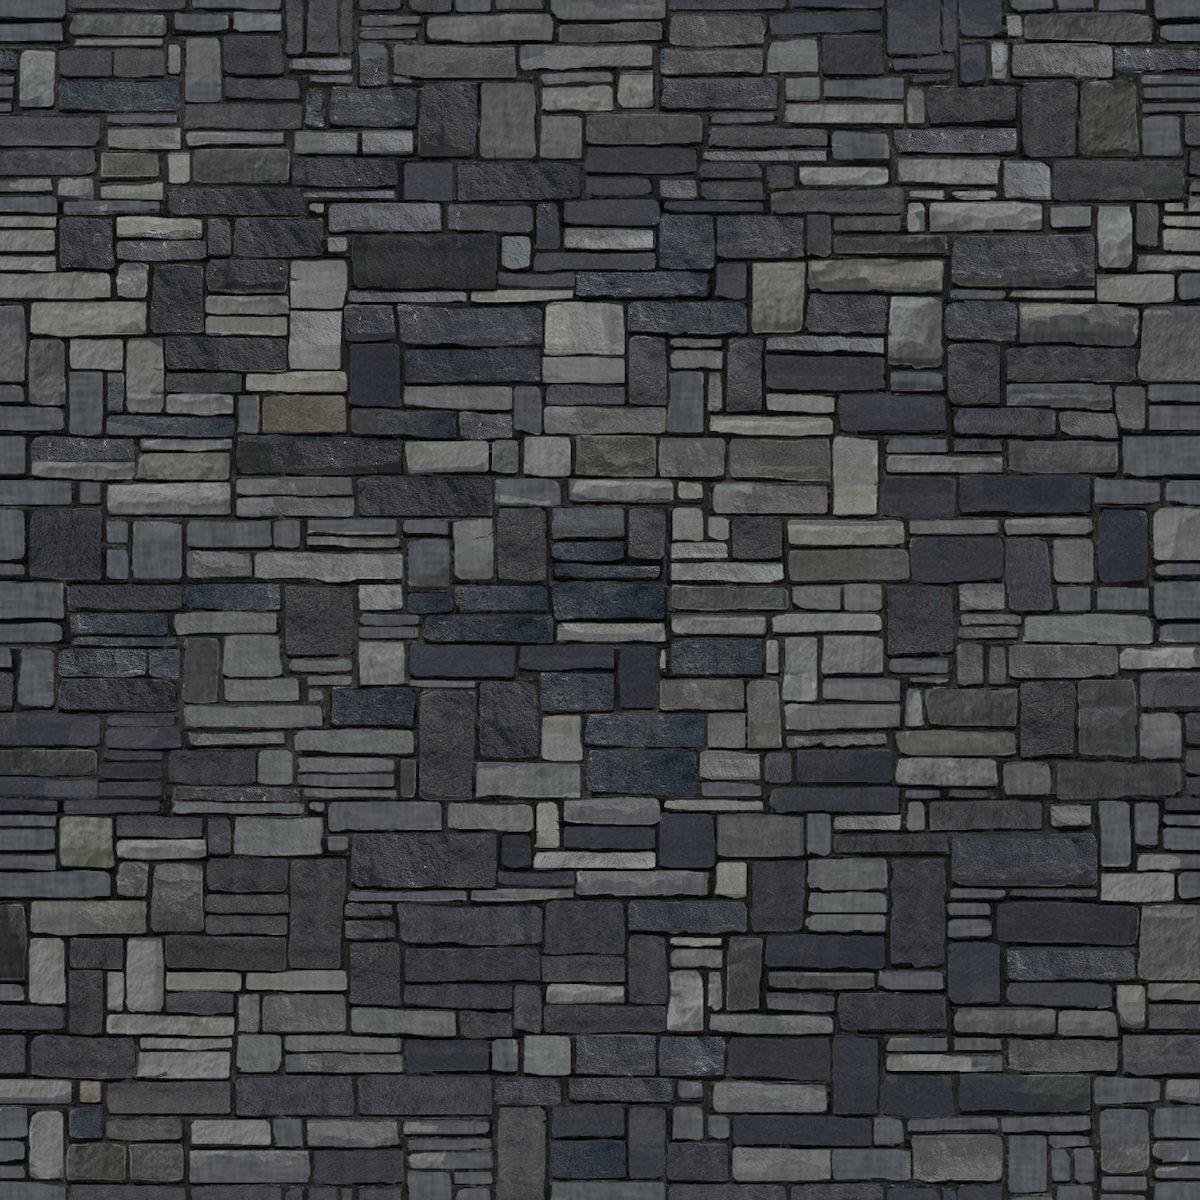 swtexture free architectural textures various stone tiles 01. Black Bedroom Furniture Sets. Home Design Ideas